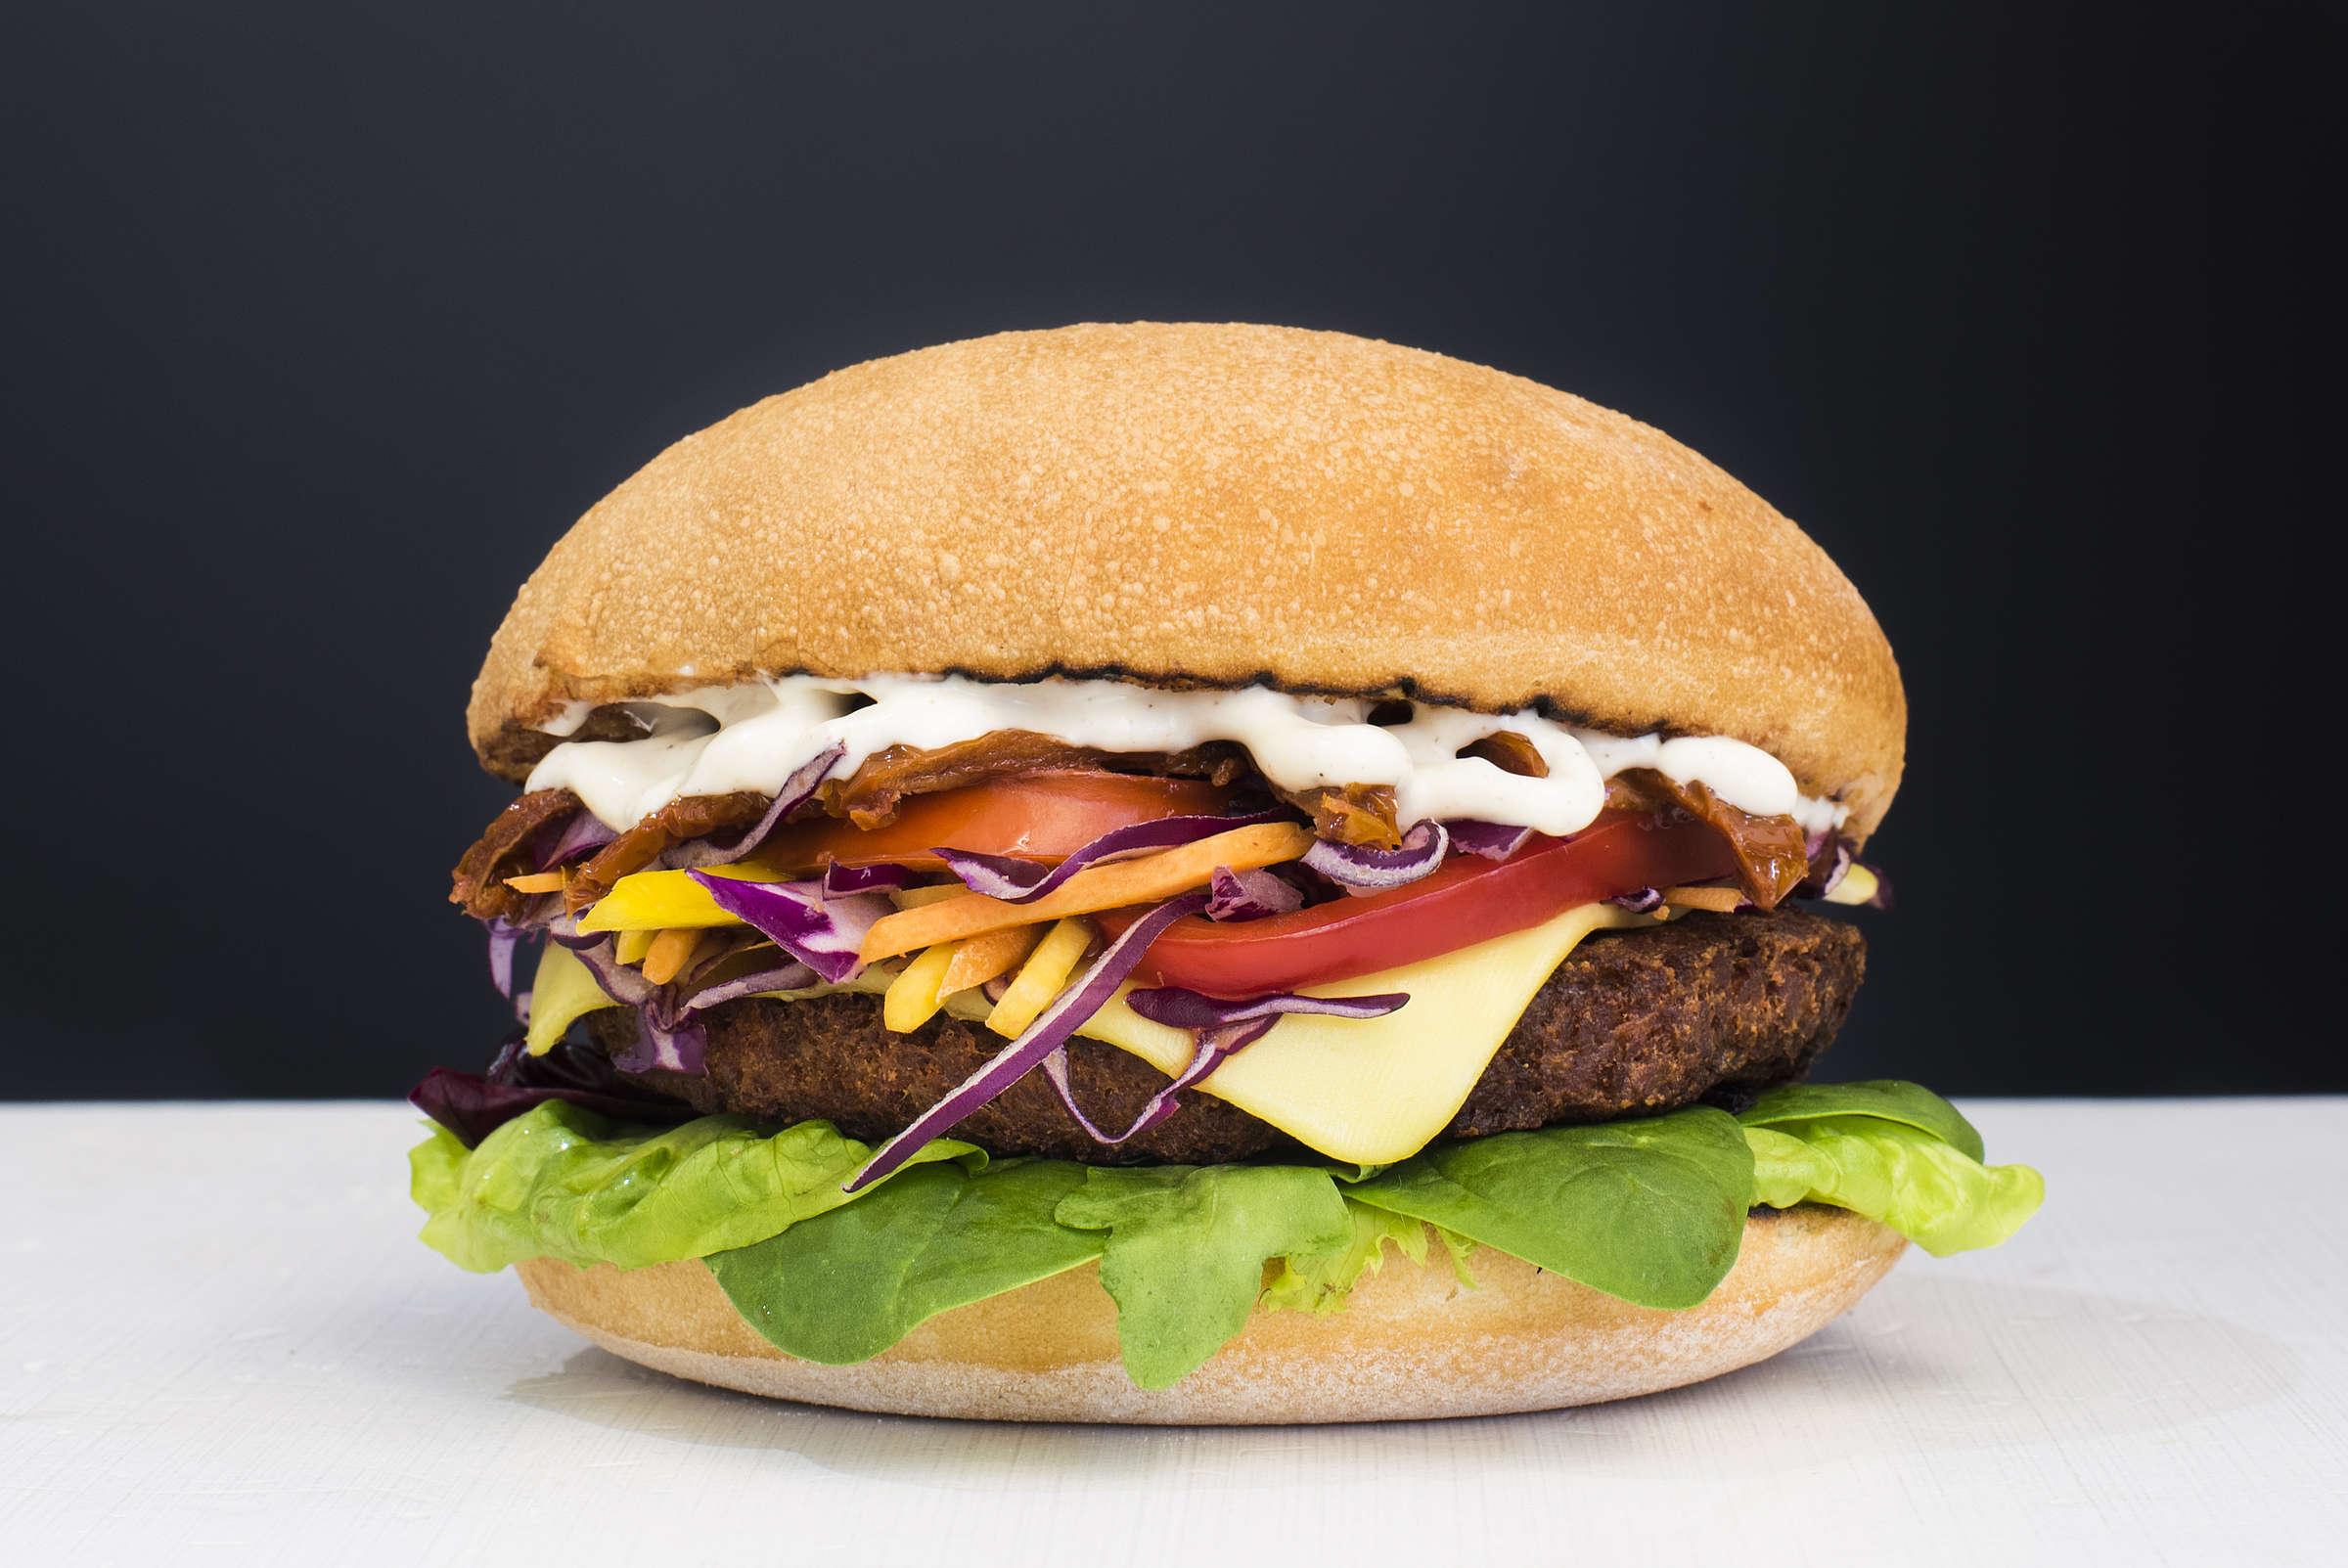 Lokal Berlin Vorankündigung 1. Dezember Free Vegan Burger by Swing Kitchen